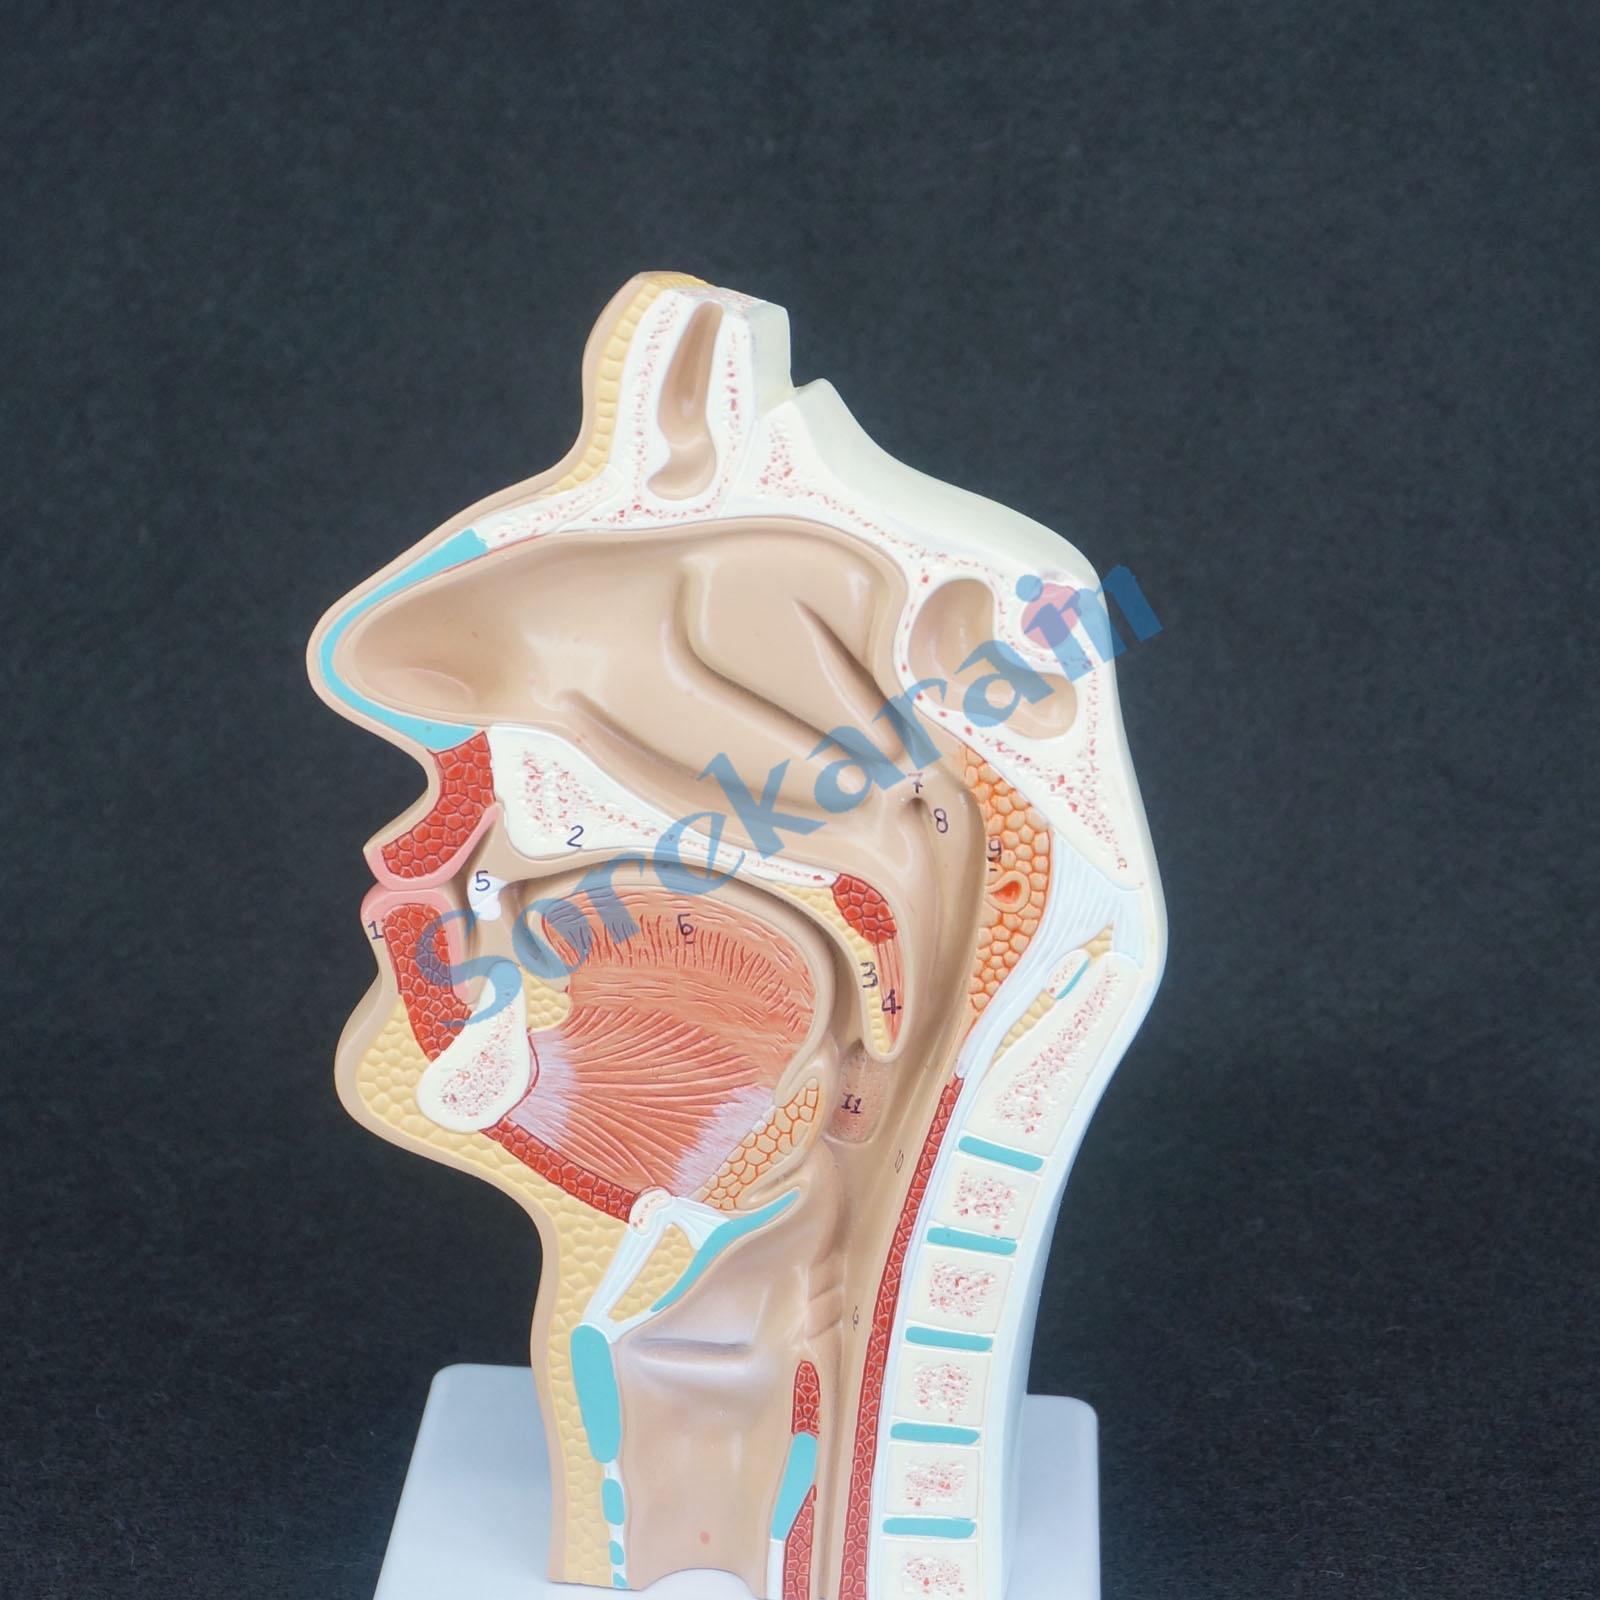 Human Pathology Nasal Cavity Oral Longitudinal Anatomica Model Medical Natural Life Size Teaching Resources